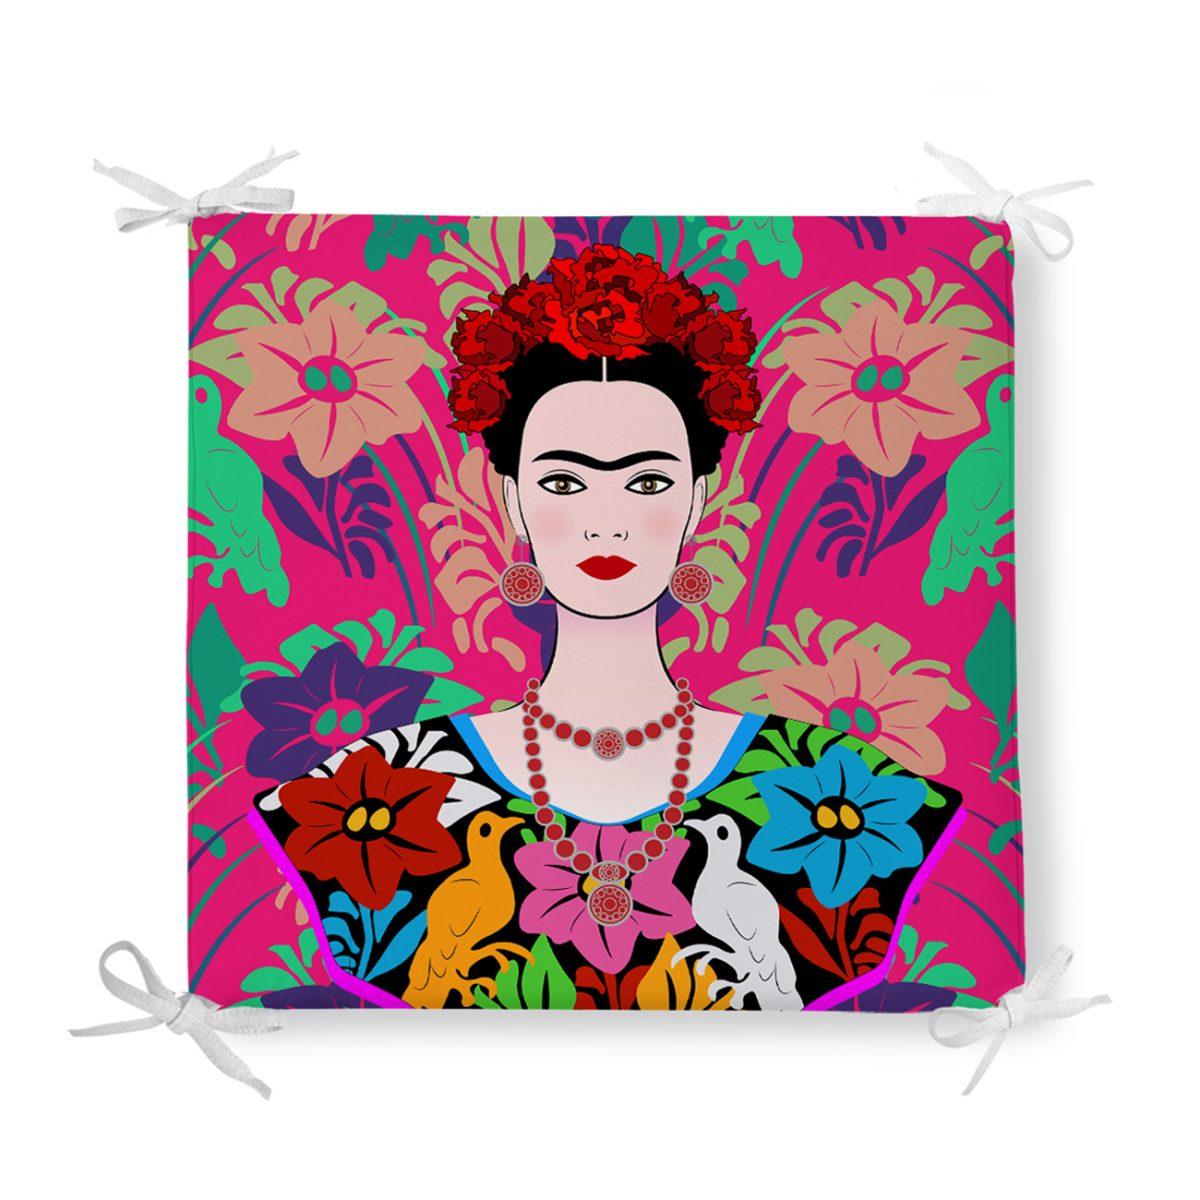 Fuşya Zeminde Frida Kahlo Motifli Özel Tasarım Fermuarlı Sandalye Minderi Realhomes